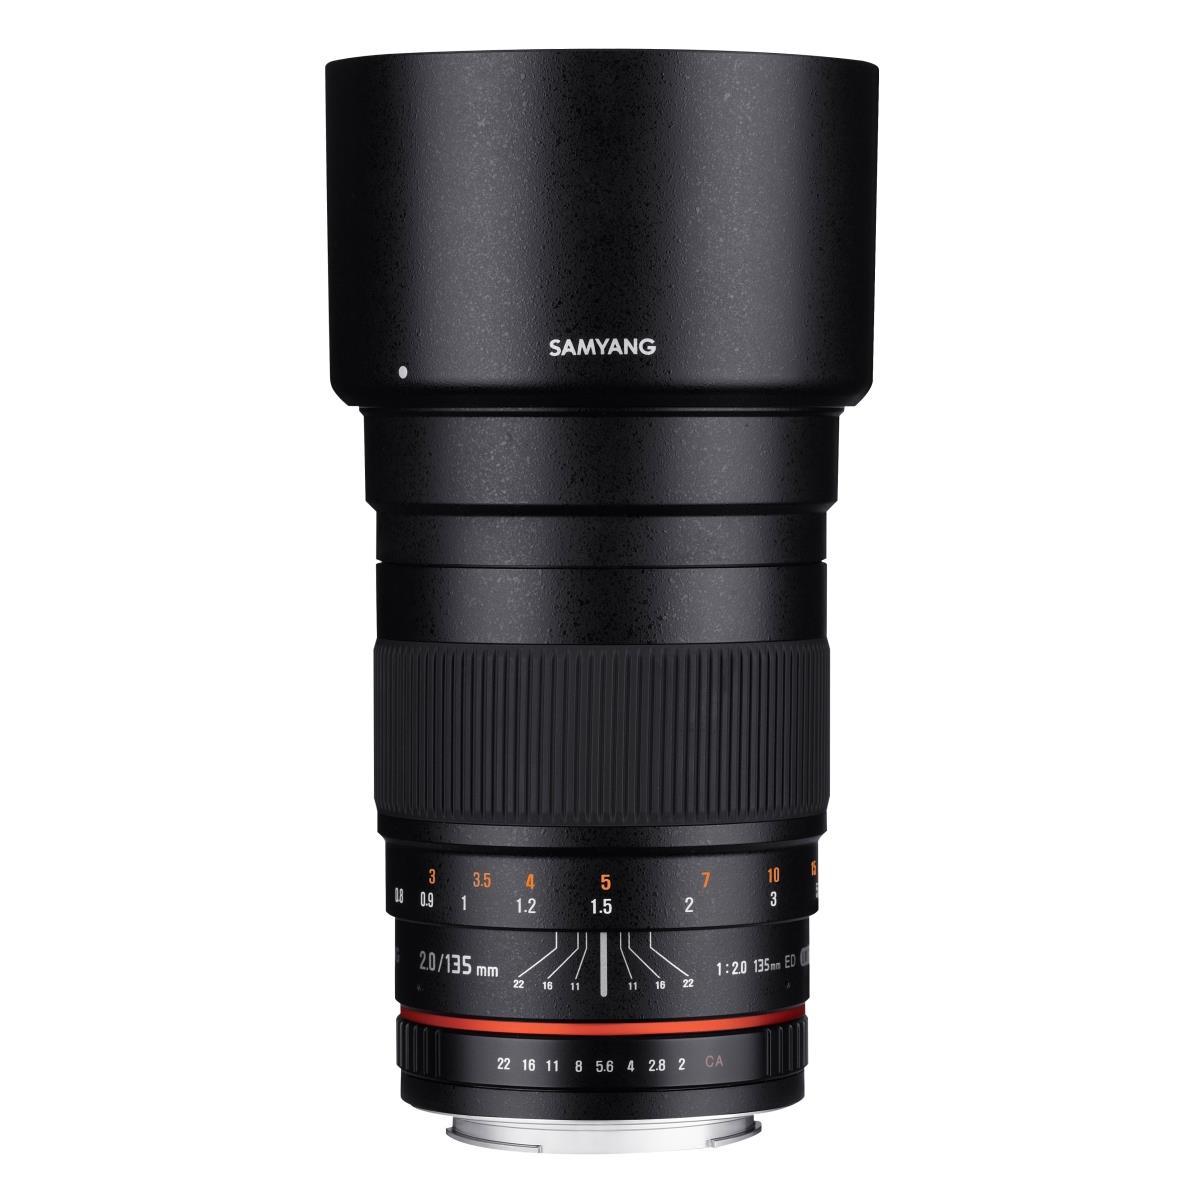 SAMYANG MF 135mm F2,0 Canon EF